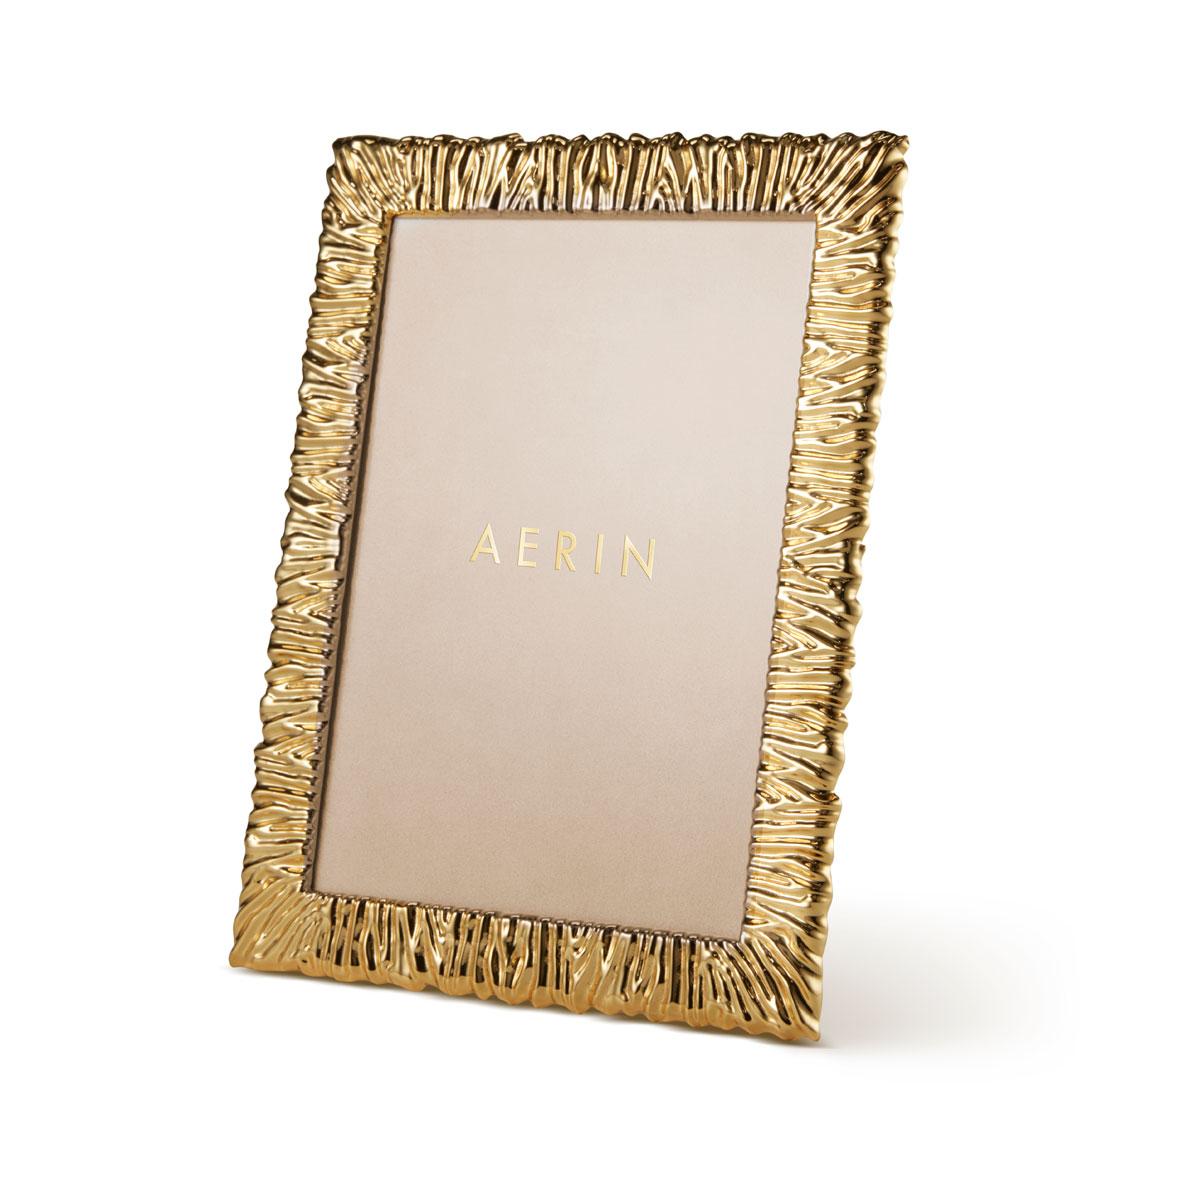 "Aerin Ambroise Gold Frame 5x7"""